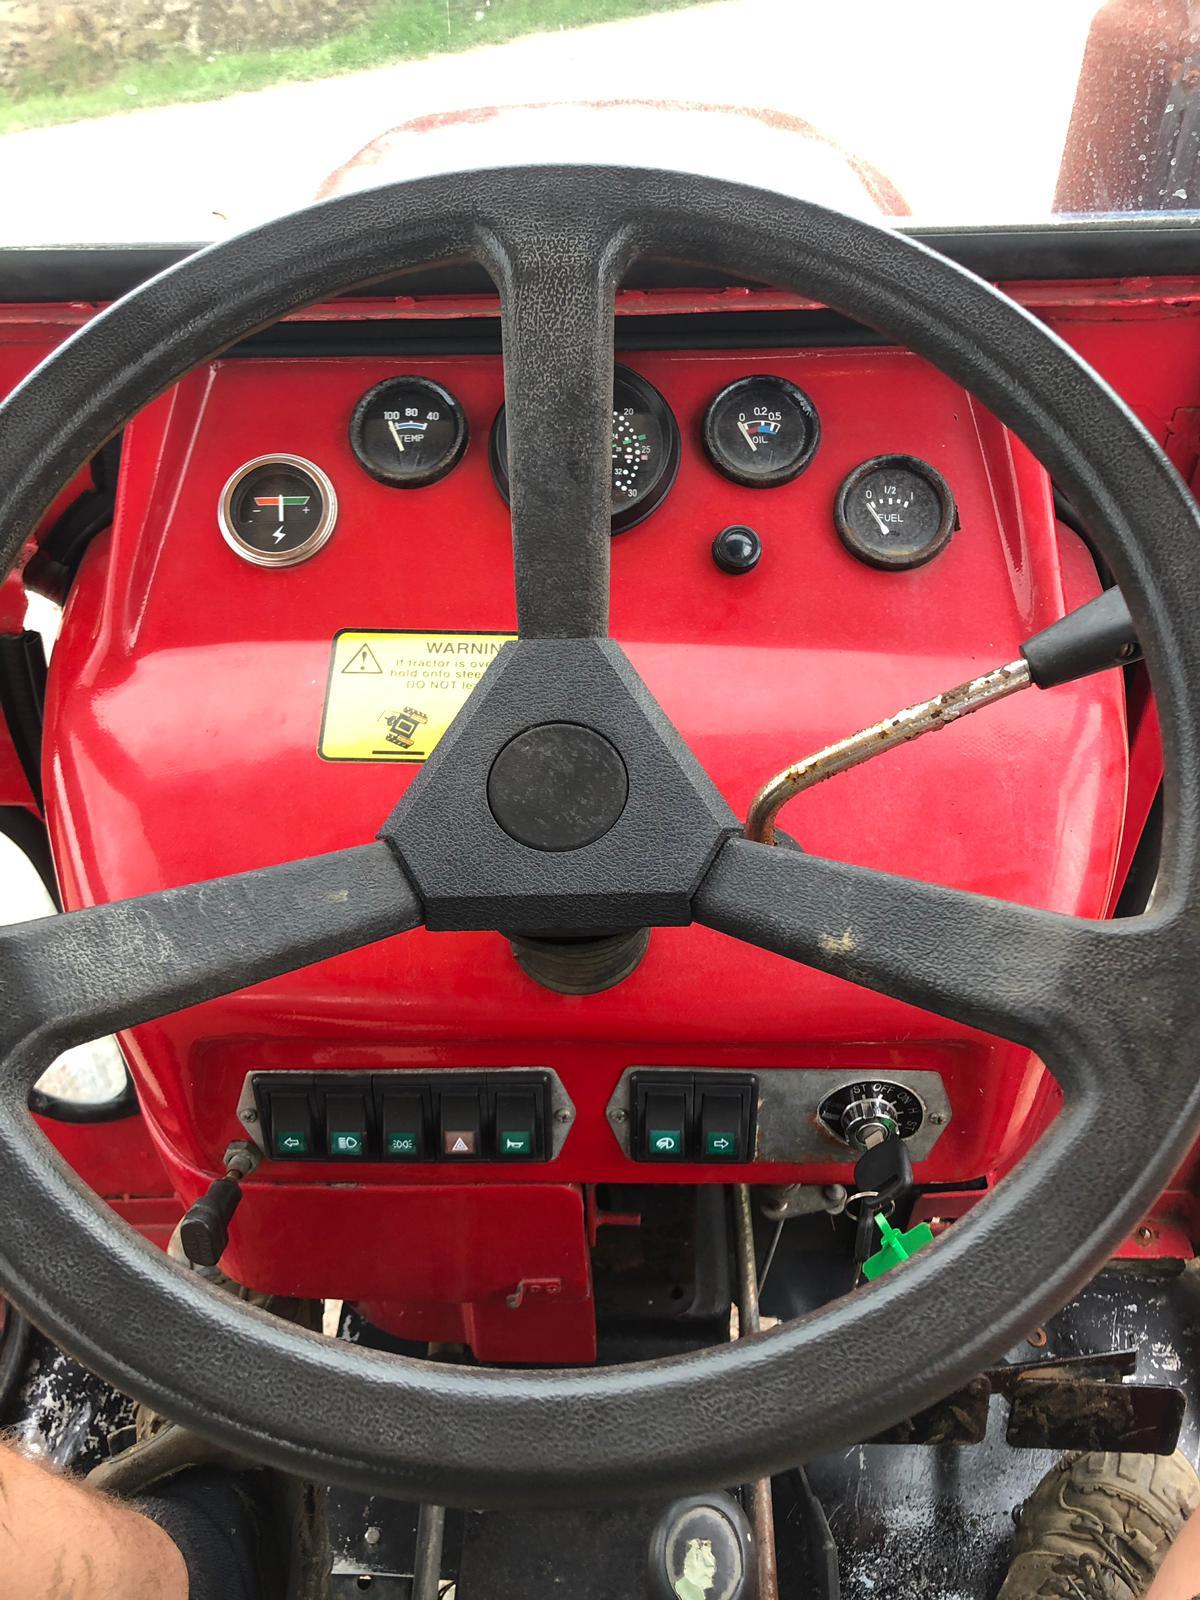 Lot 58 - SIROMER 204S COMPACT TRACTOR 4 WHEEL DRIVE, YEAR 2006, RUNS, WORKS & DRIVES *NO VAT*